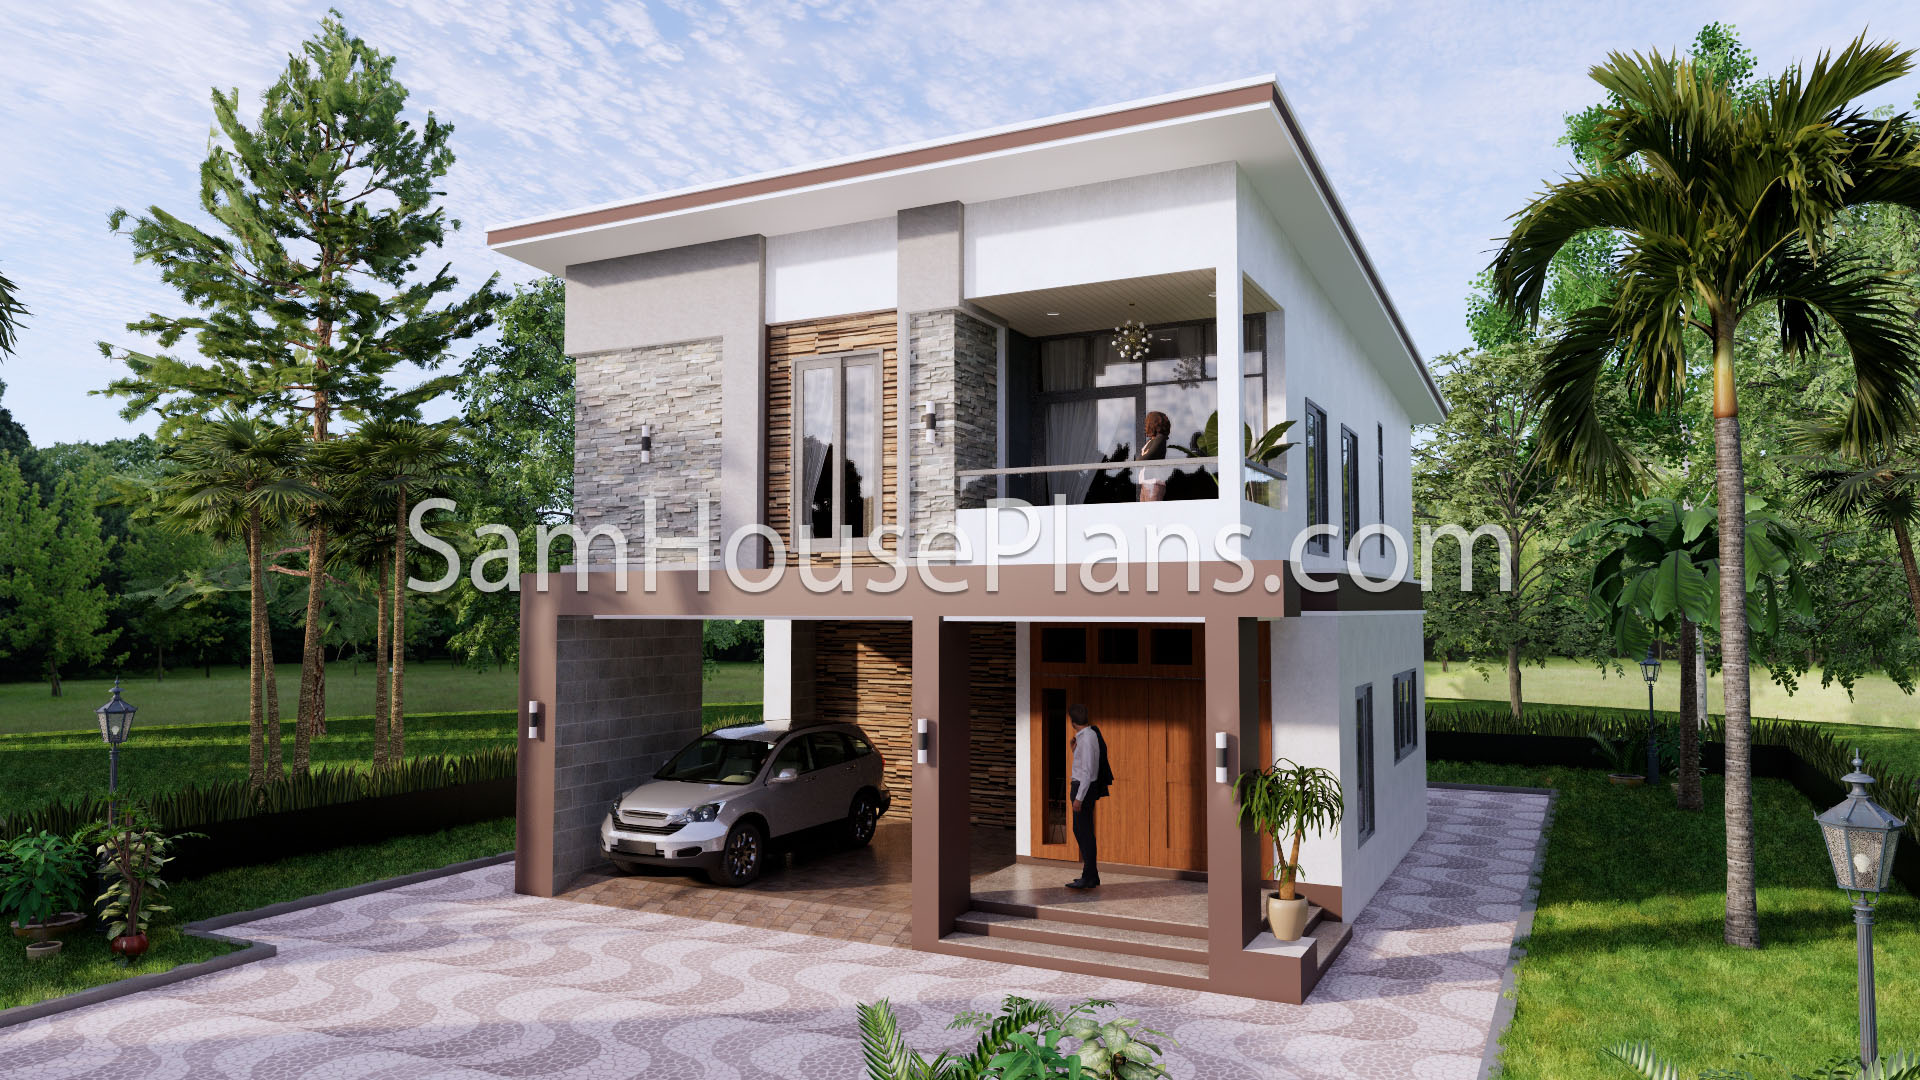 27x40 House Plans 8x10 Meters 4 Bedrooms 1